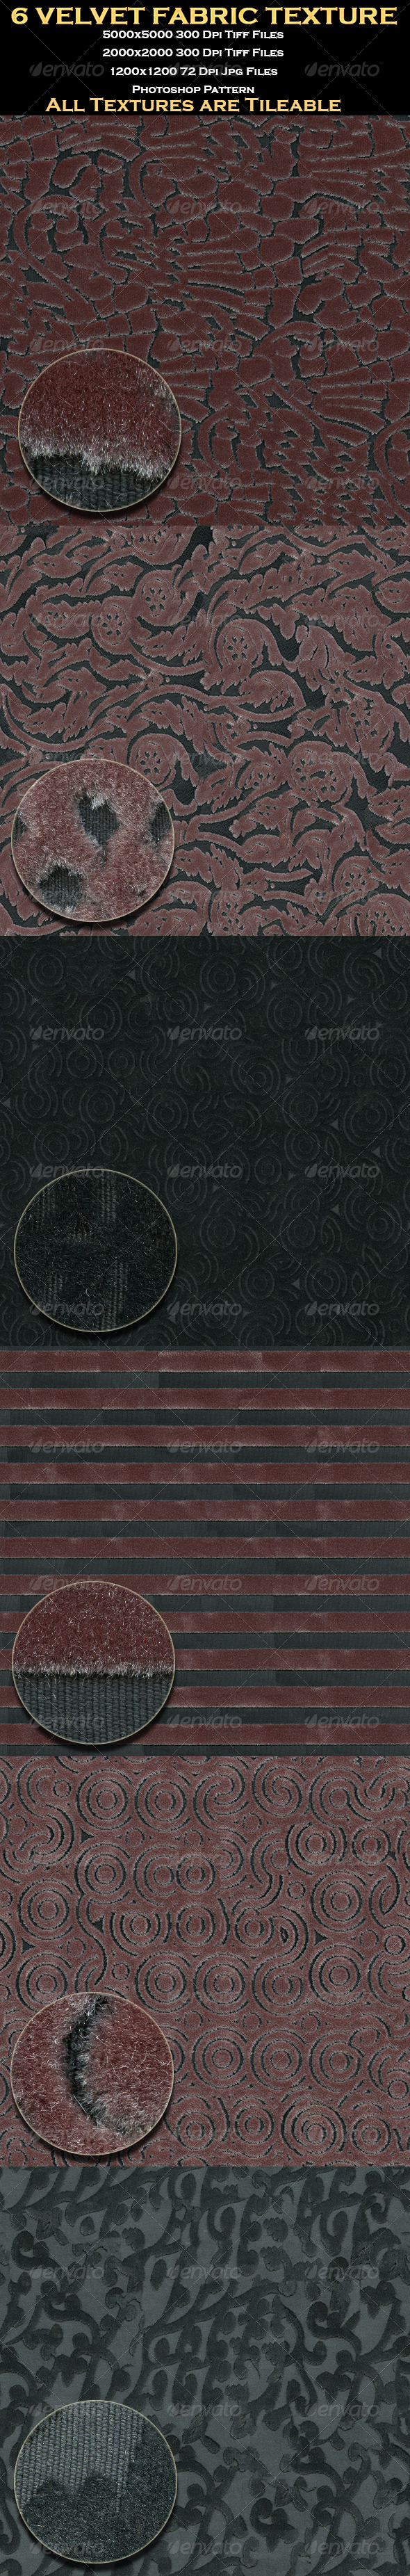 6 Velvet Fabric Texture - Textures